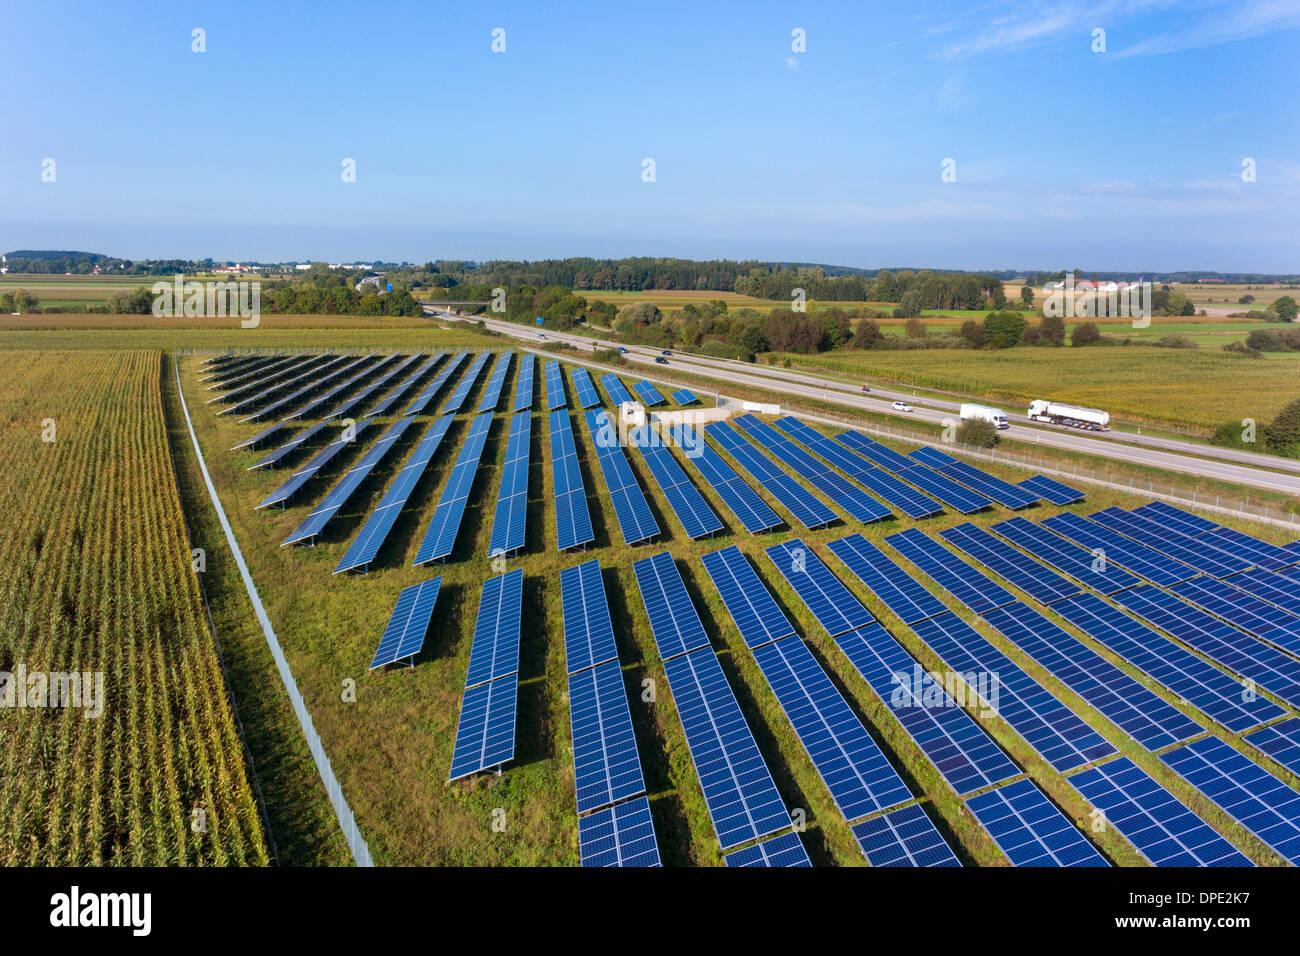 View of solar power panels, Munich, Bavaria, Germany - Stock Image